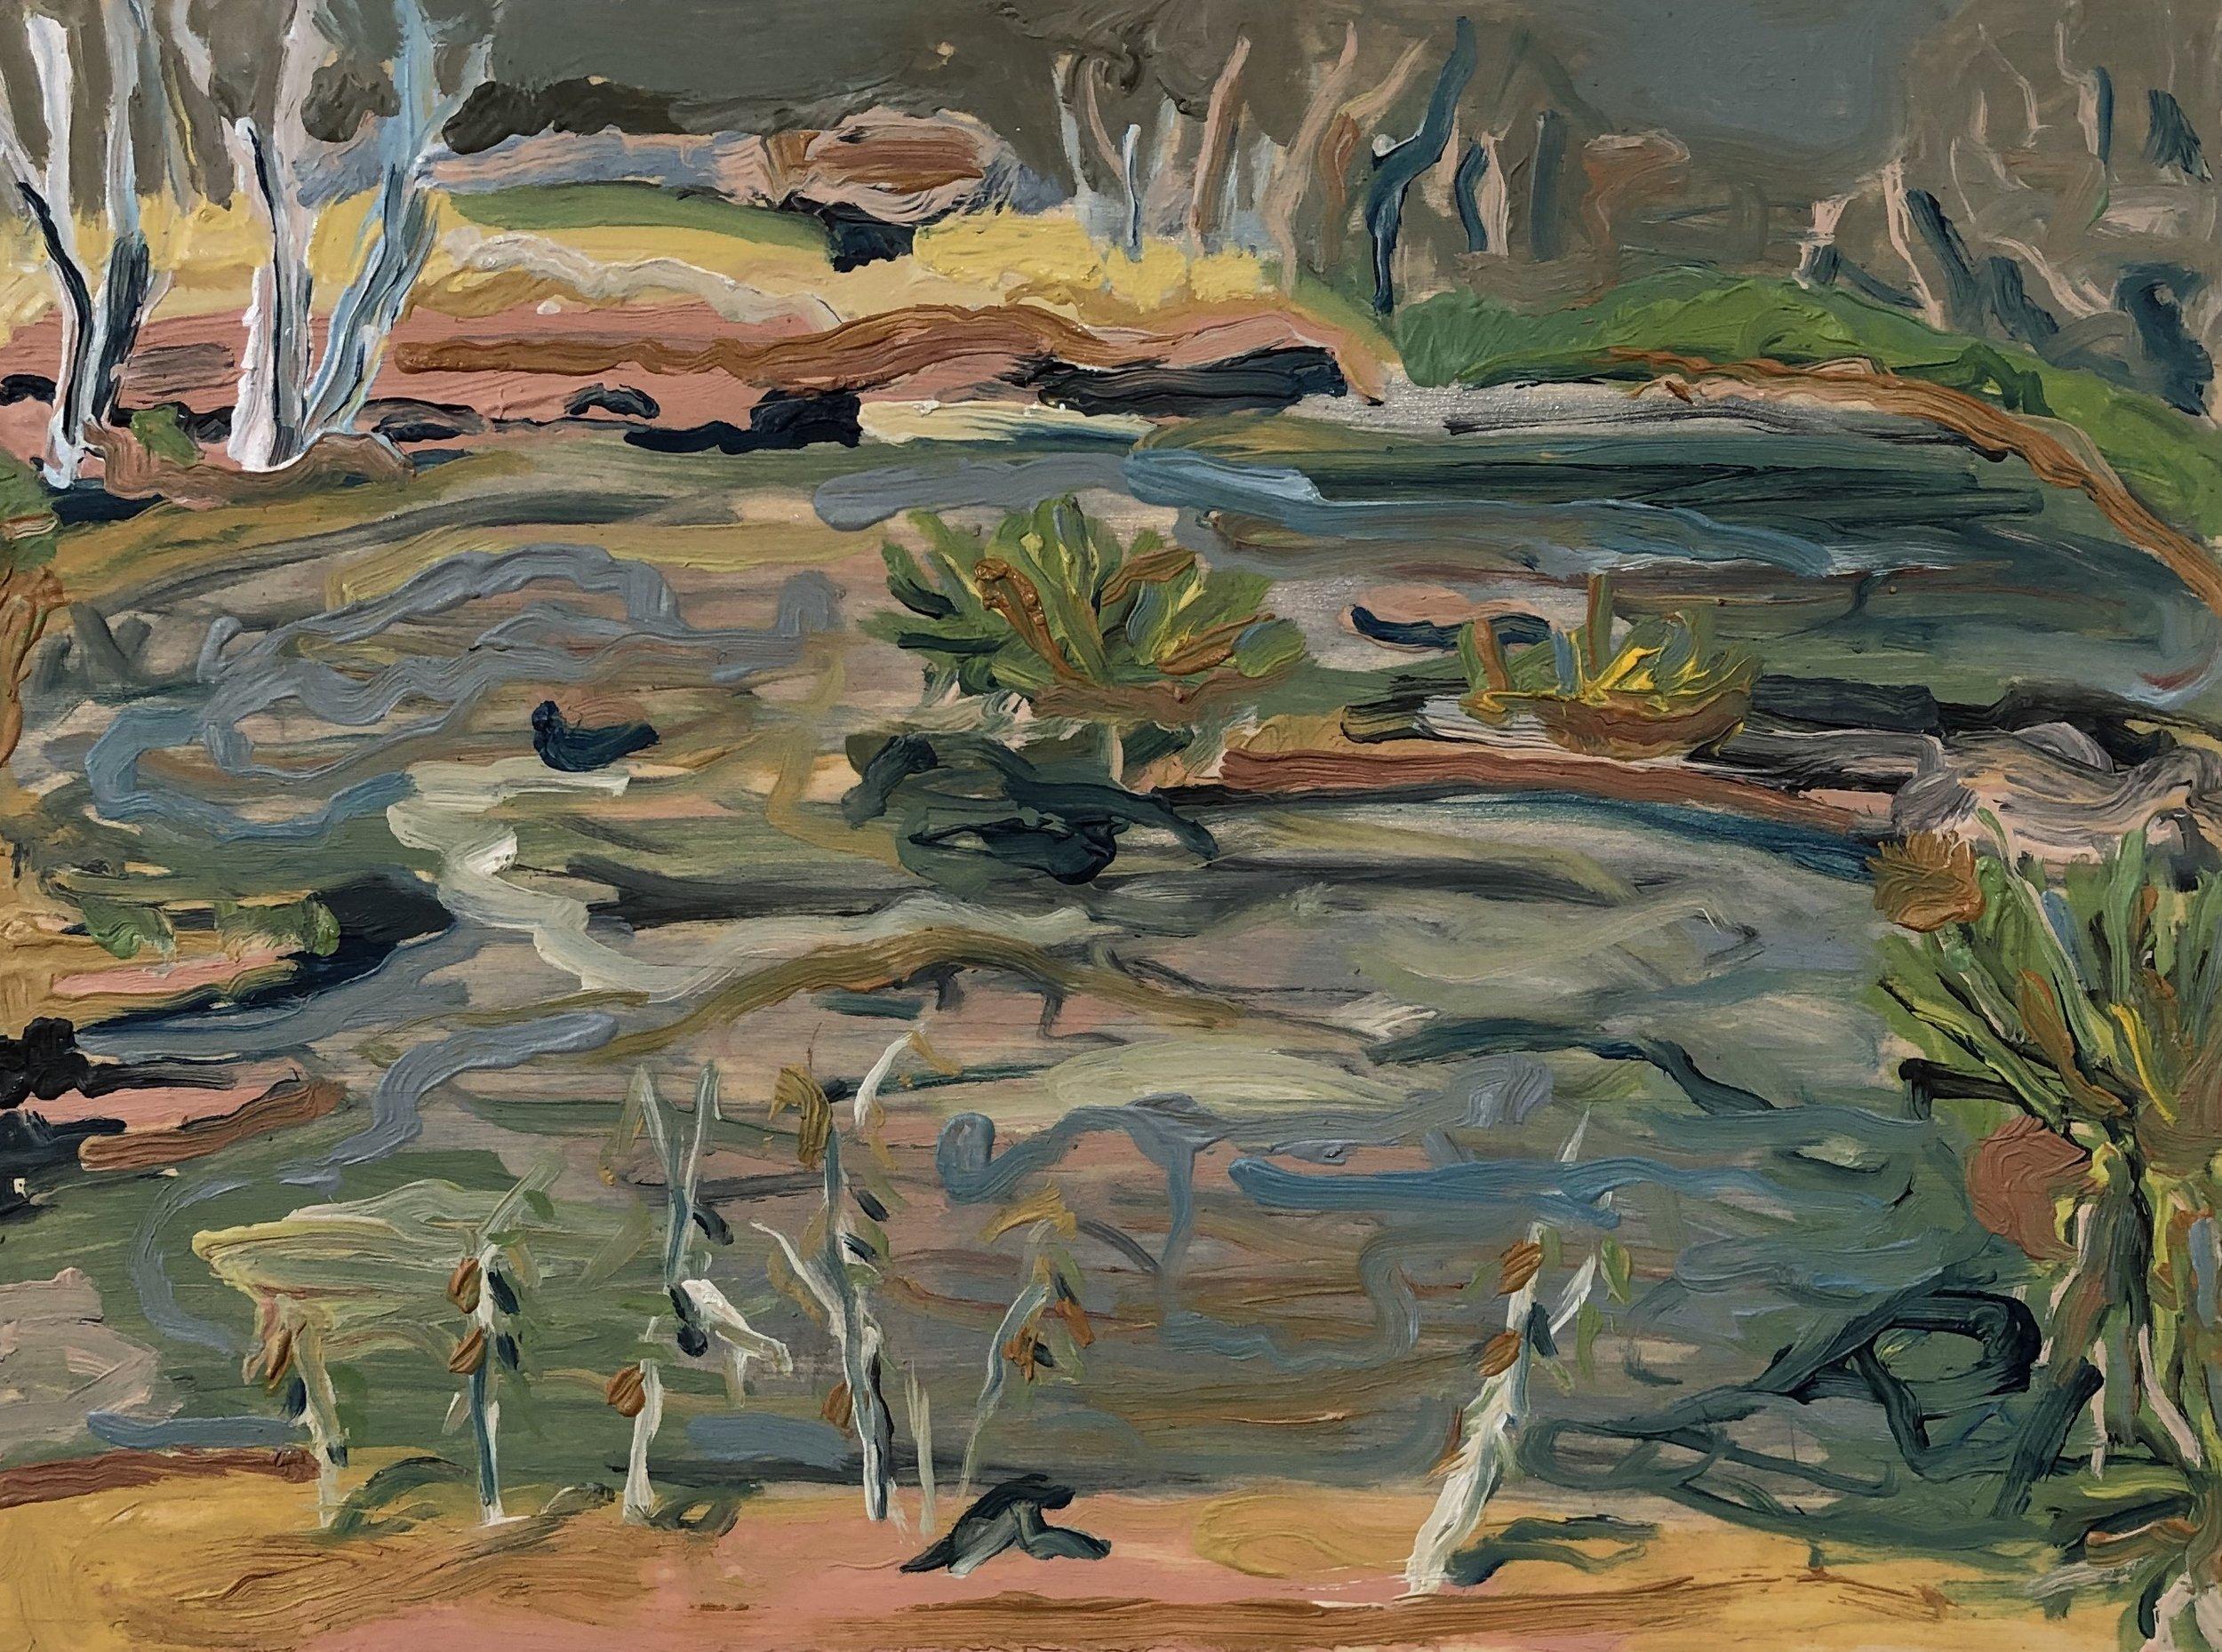 .Michelle Teear Edward Pool 2019  (En plein study at Edward River, Kimberley, WA) Oil on plywood, egg emulsion  300 x 400mm $300.00 unframed  $400.00 framed   SOLD